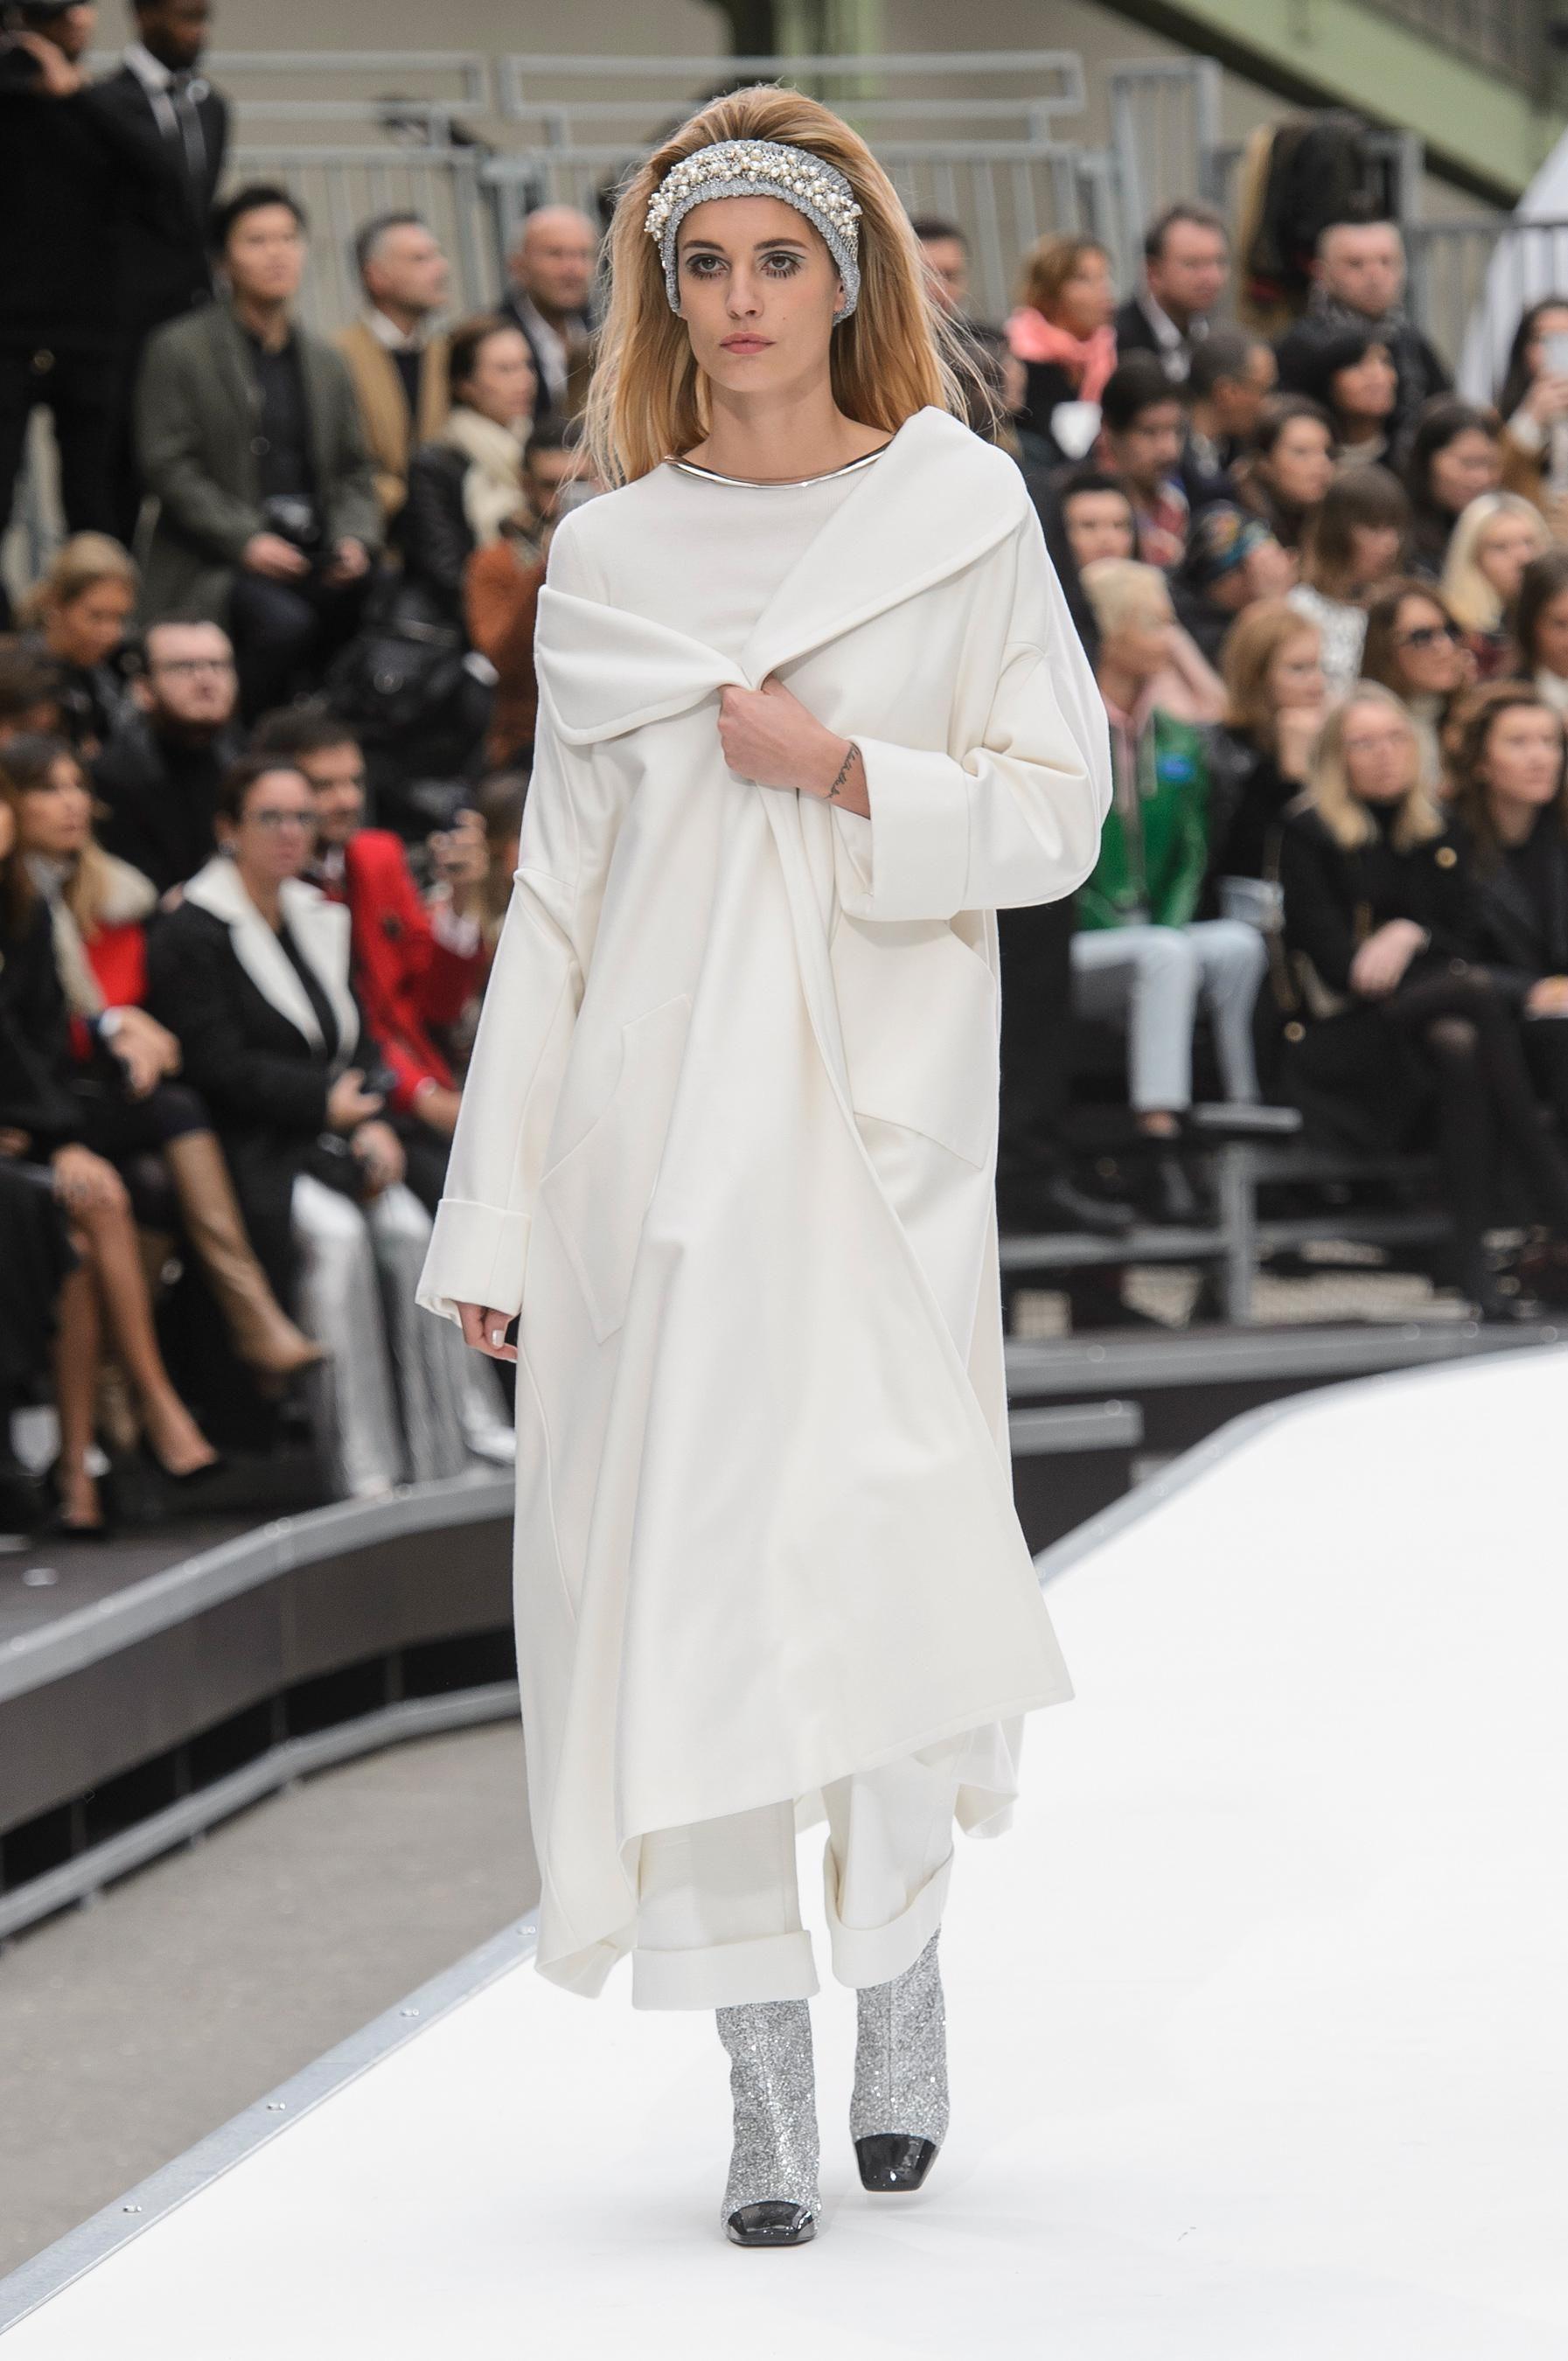 Chanel fashion show 2018 video 8